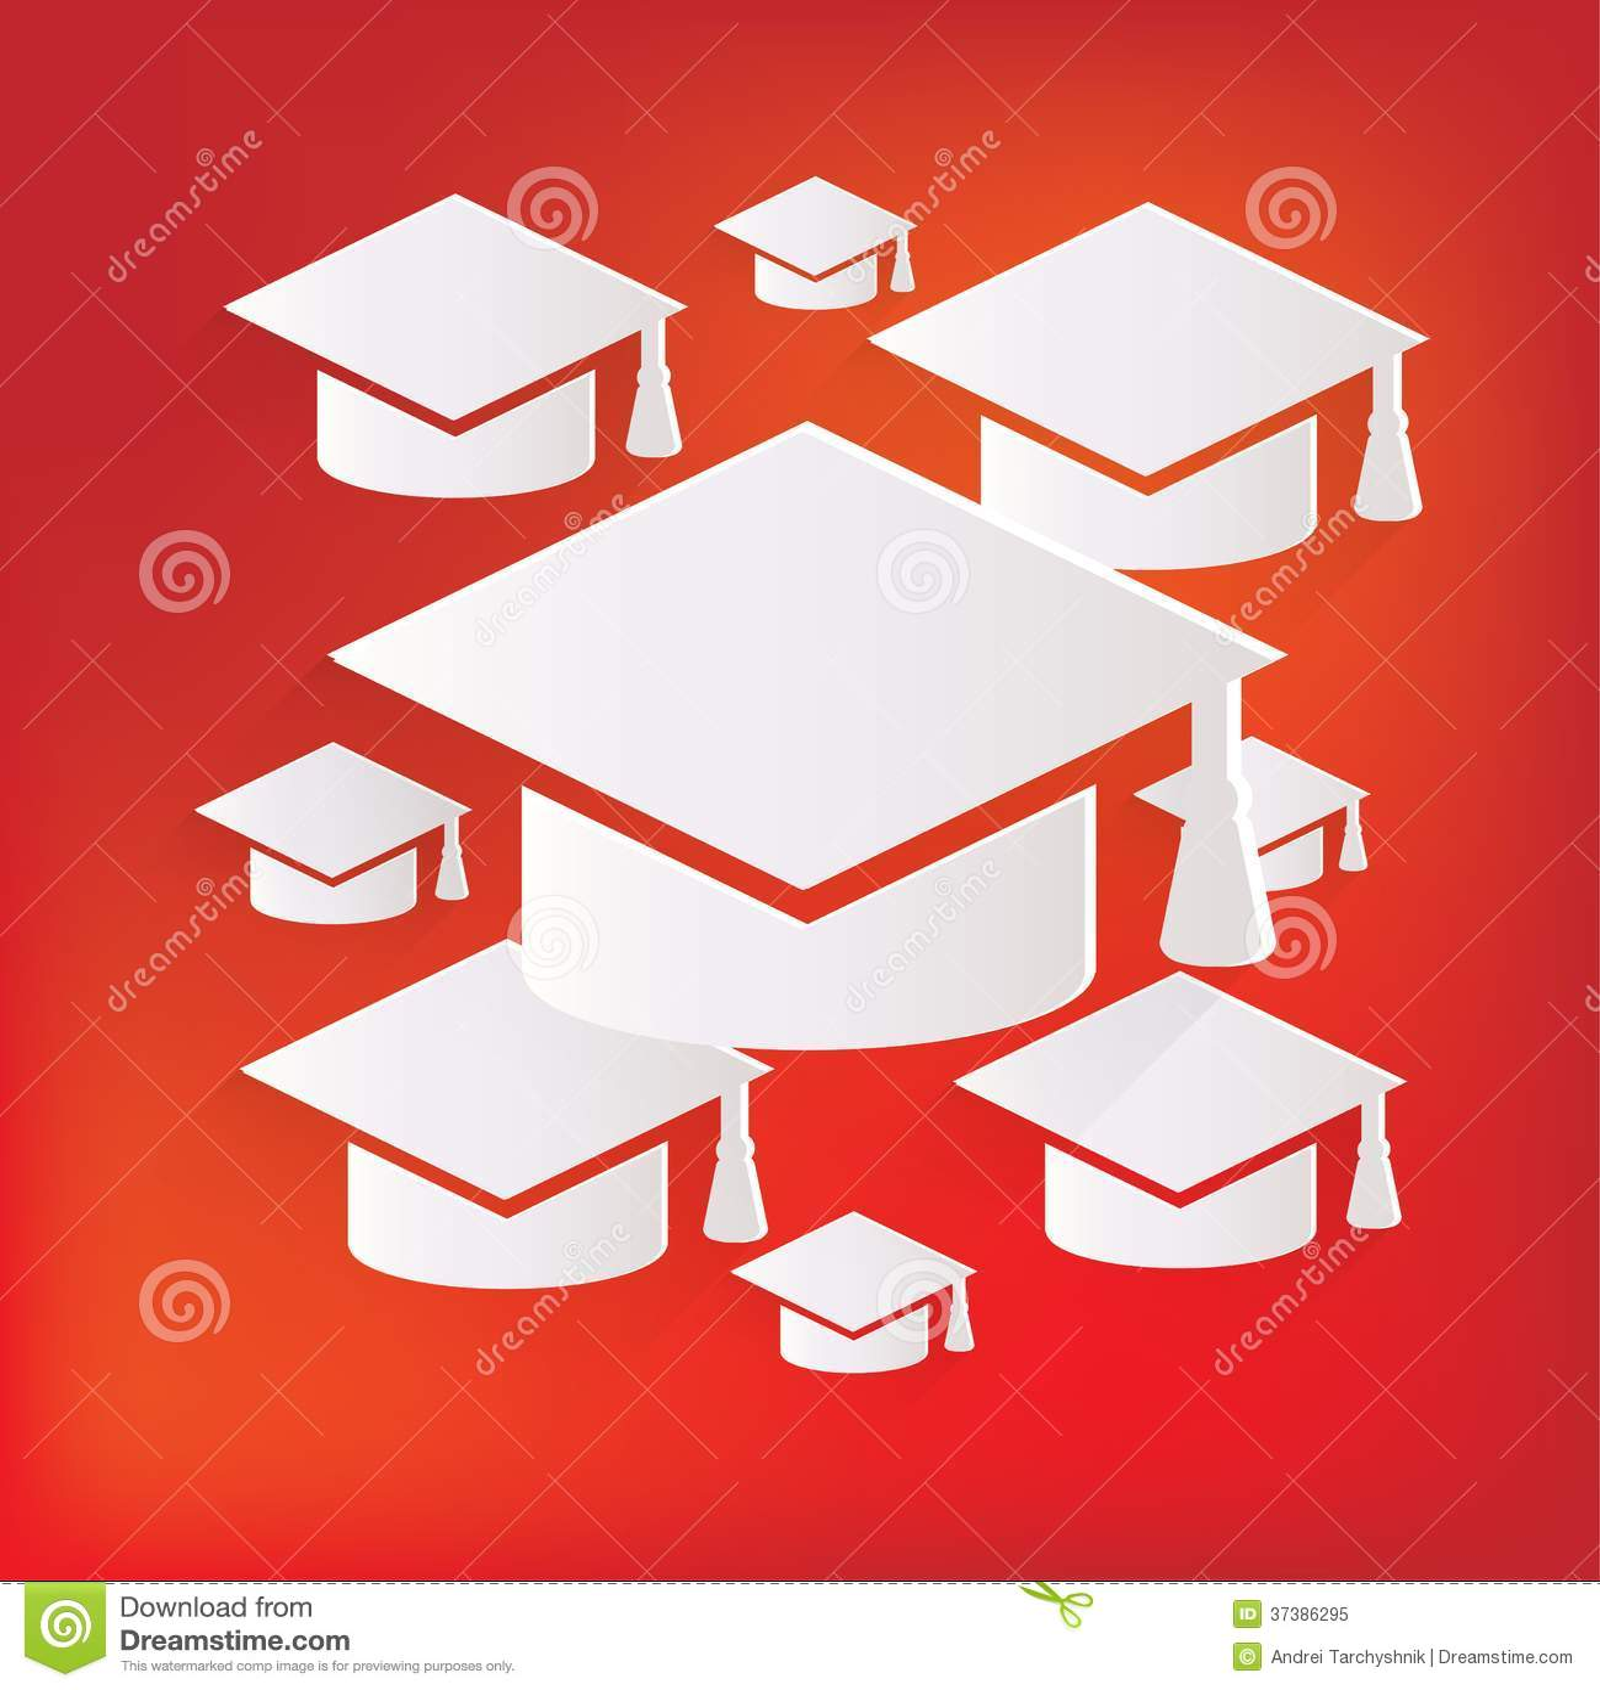 100 Free Graduation Hat amp Graduation Images  Pixabay